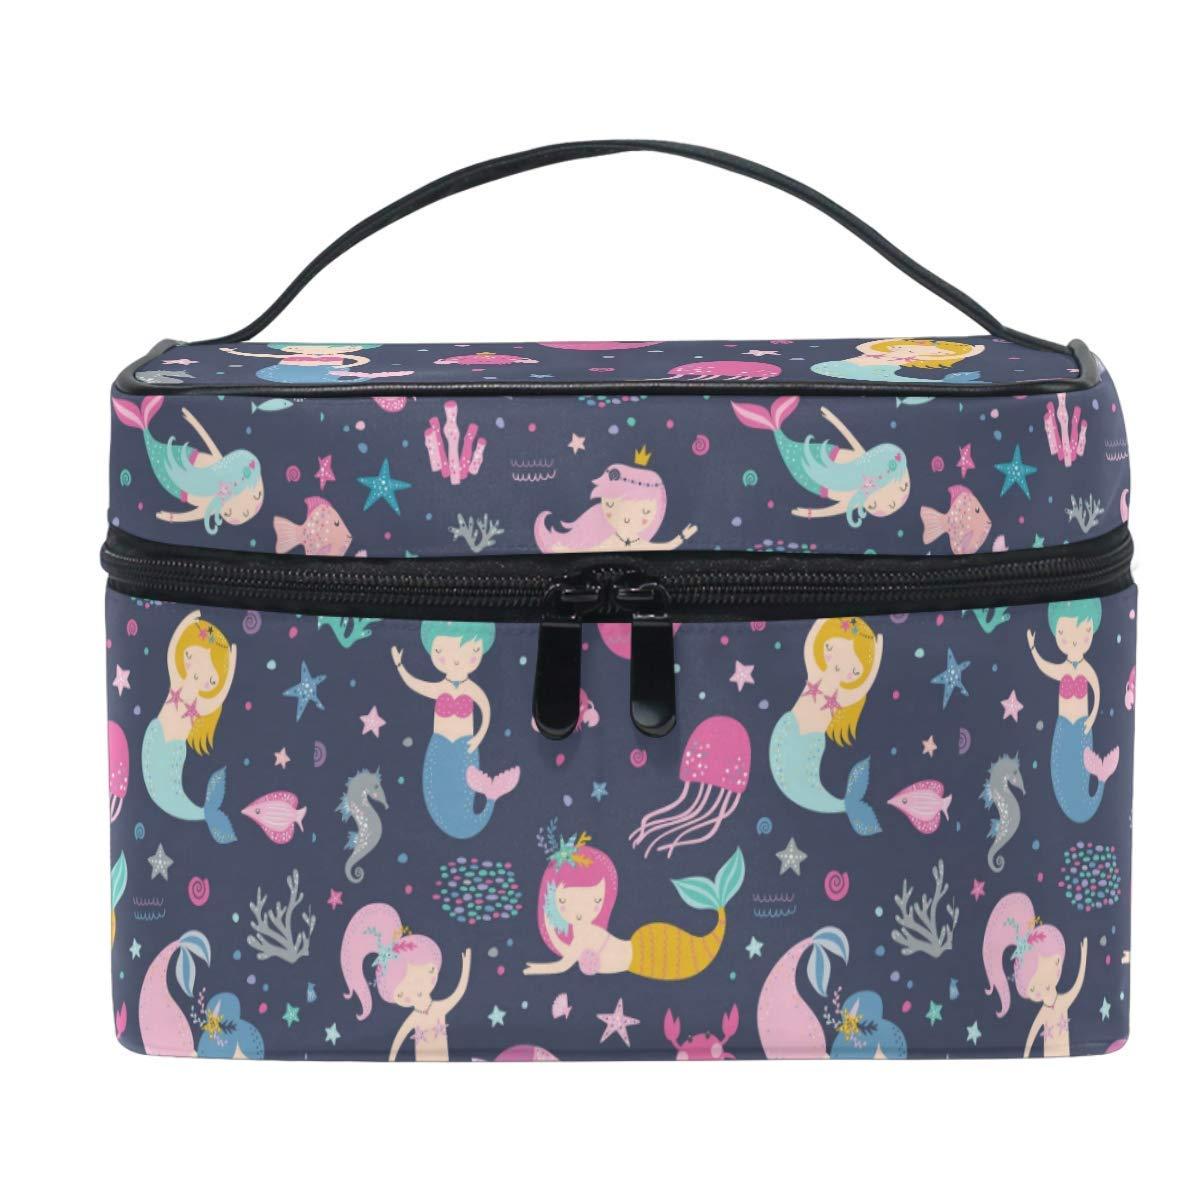 Cute Mermaids Makeup Bag Handbag Bag Cartoon Fish Jellyfish Cosmetic Bag Toiletry Travel Brush Train Case for Women Zip Carrying Portable Multifunctional Organizer Storage Pouch Bags Box